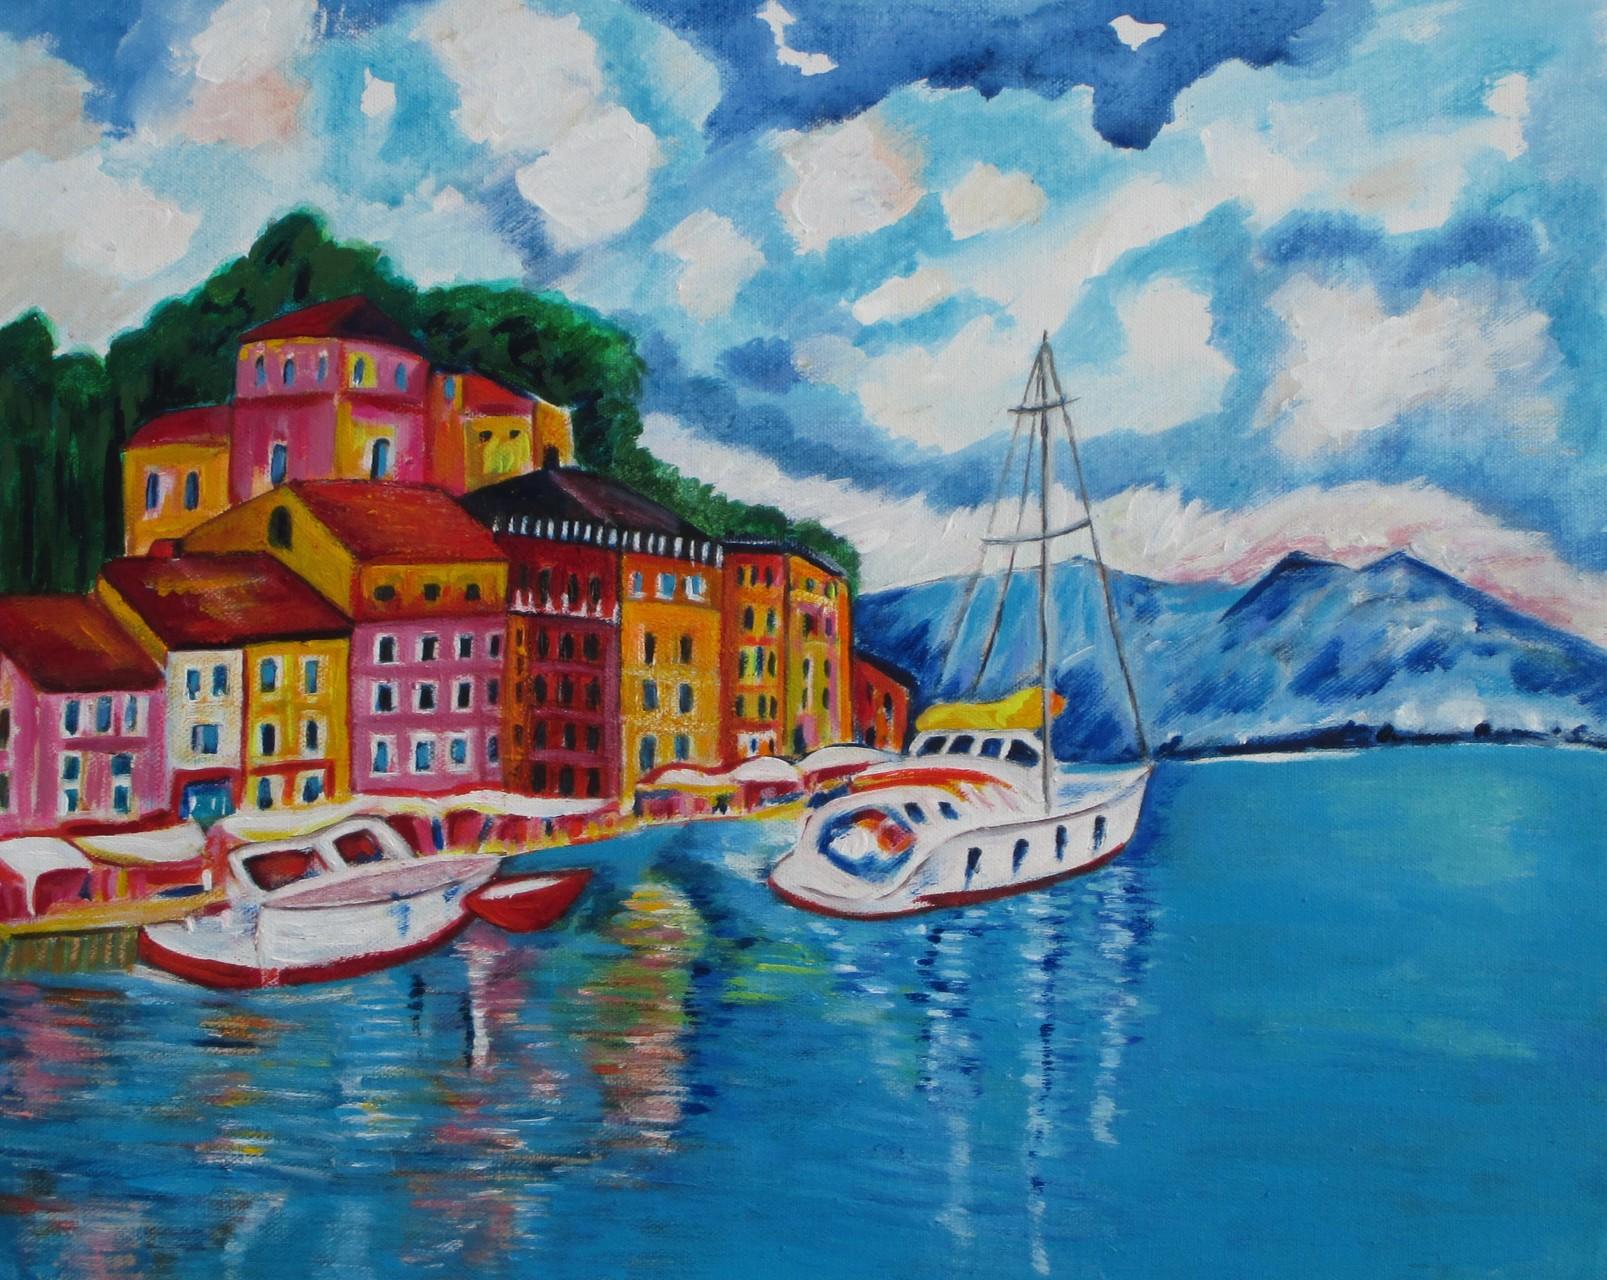 Portofino, acrylic on canvas, 20 x 16, 2015